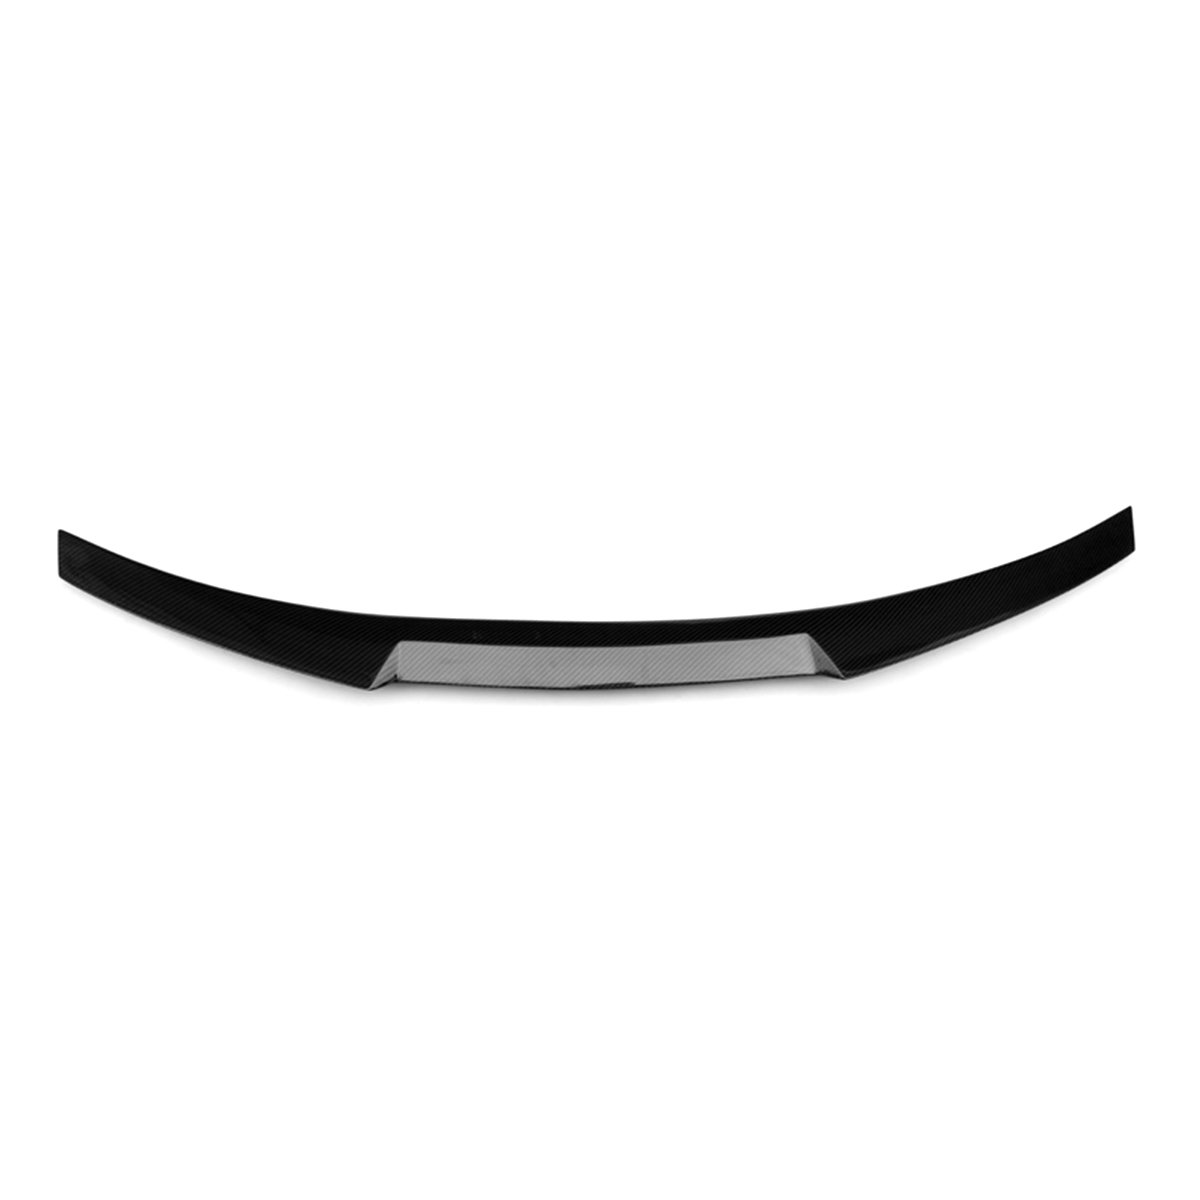 Carbon Fiber Rear Trunk Spoiler Wing for PASSAT 2010-2016